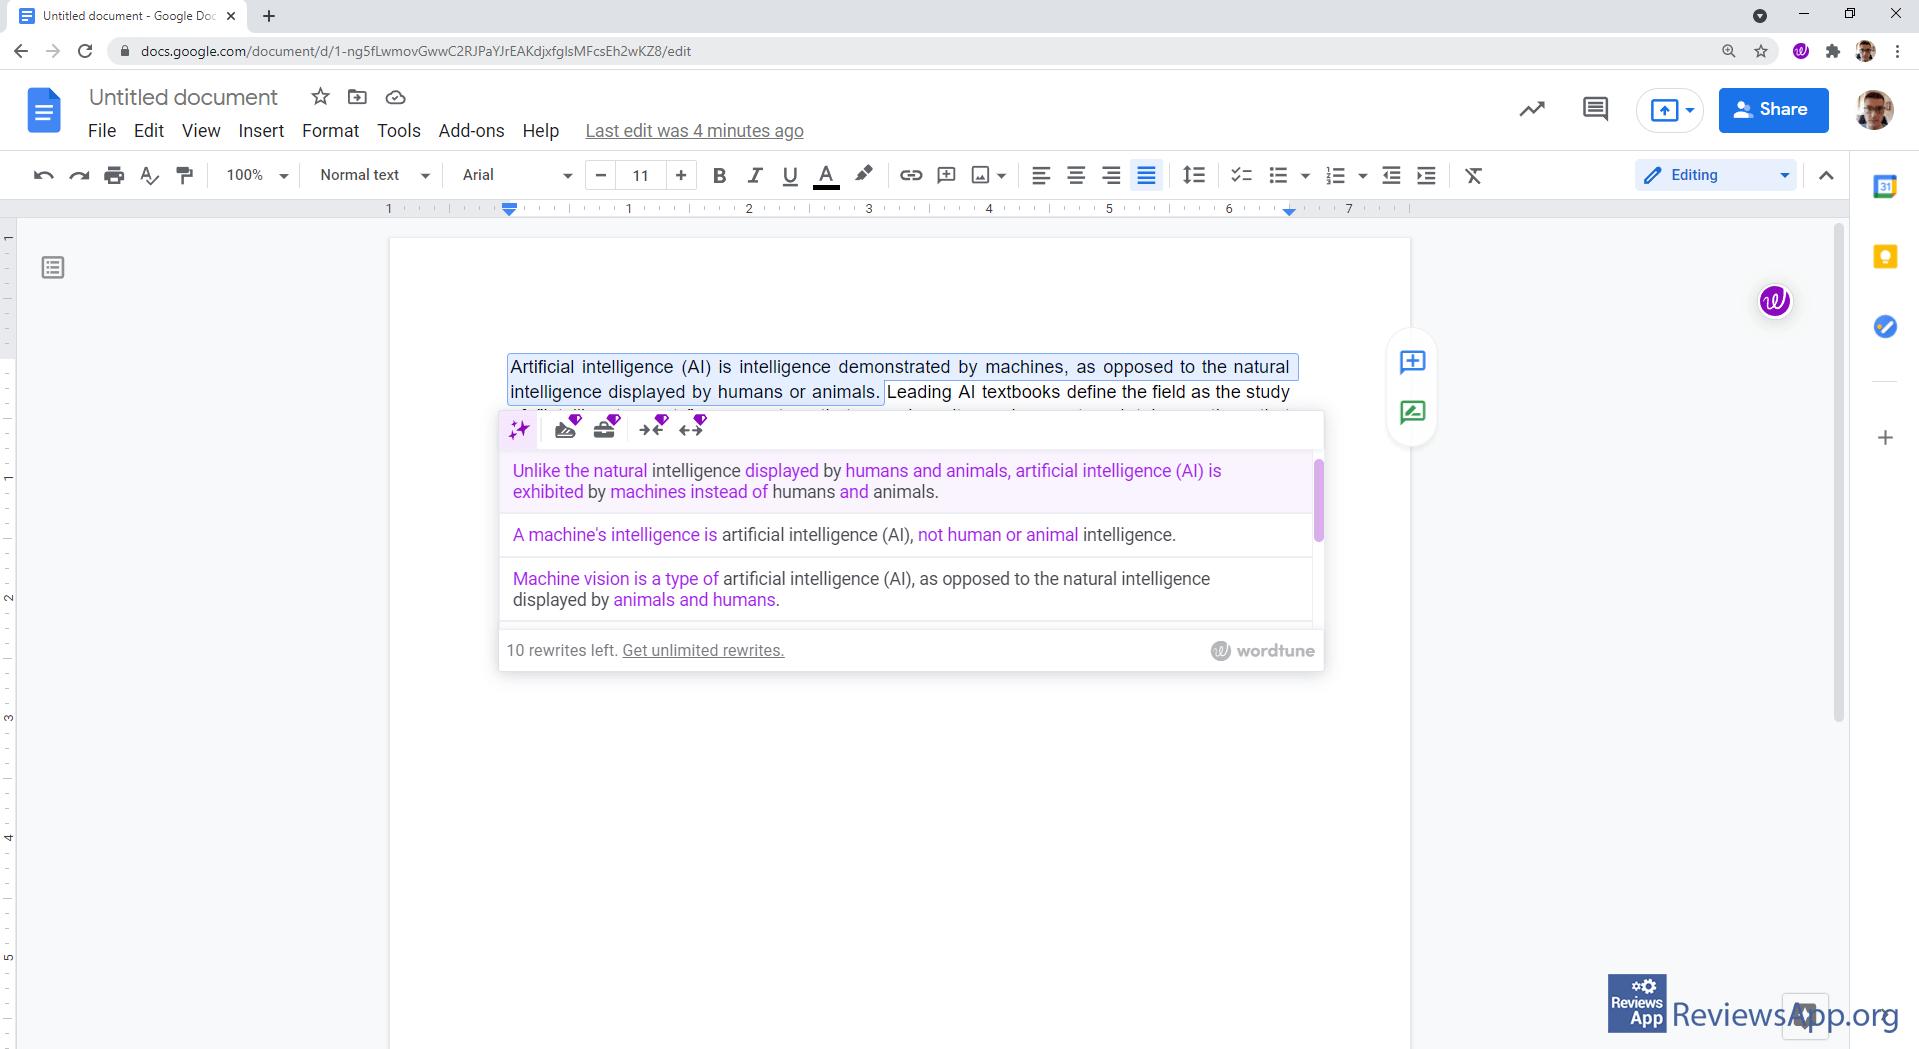 Wordtune in Google Docs